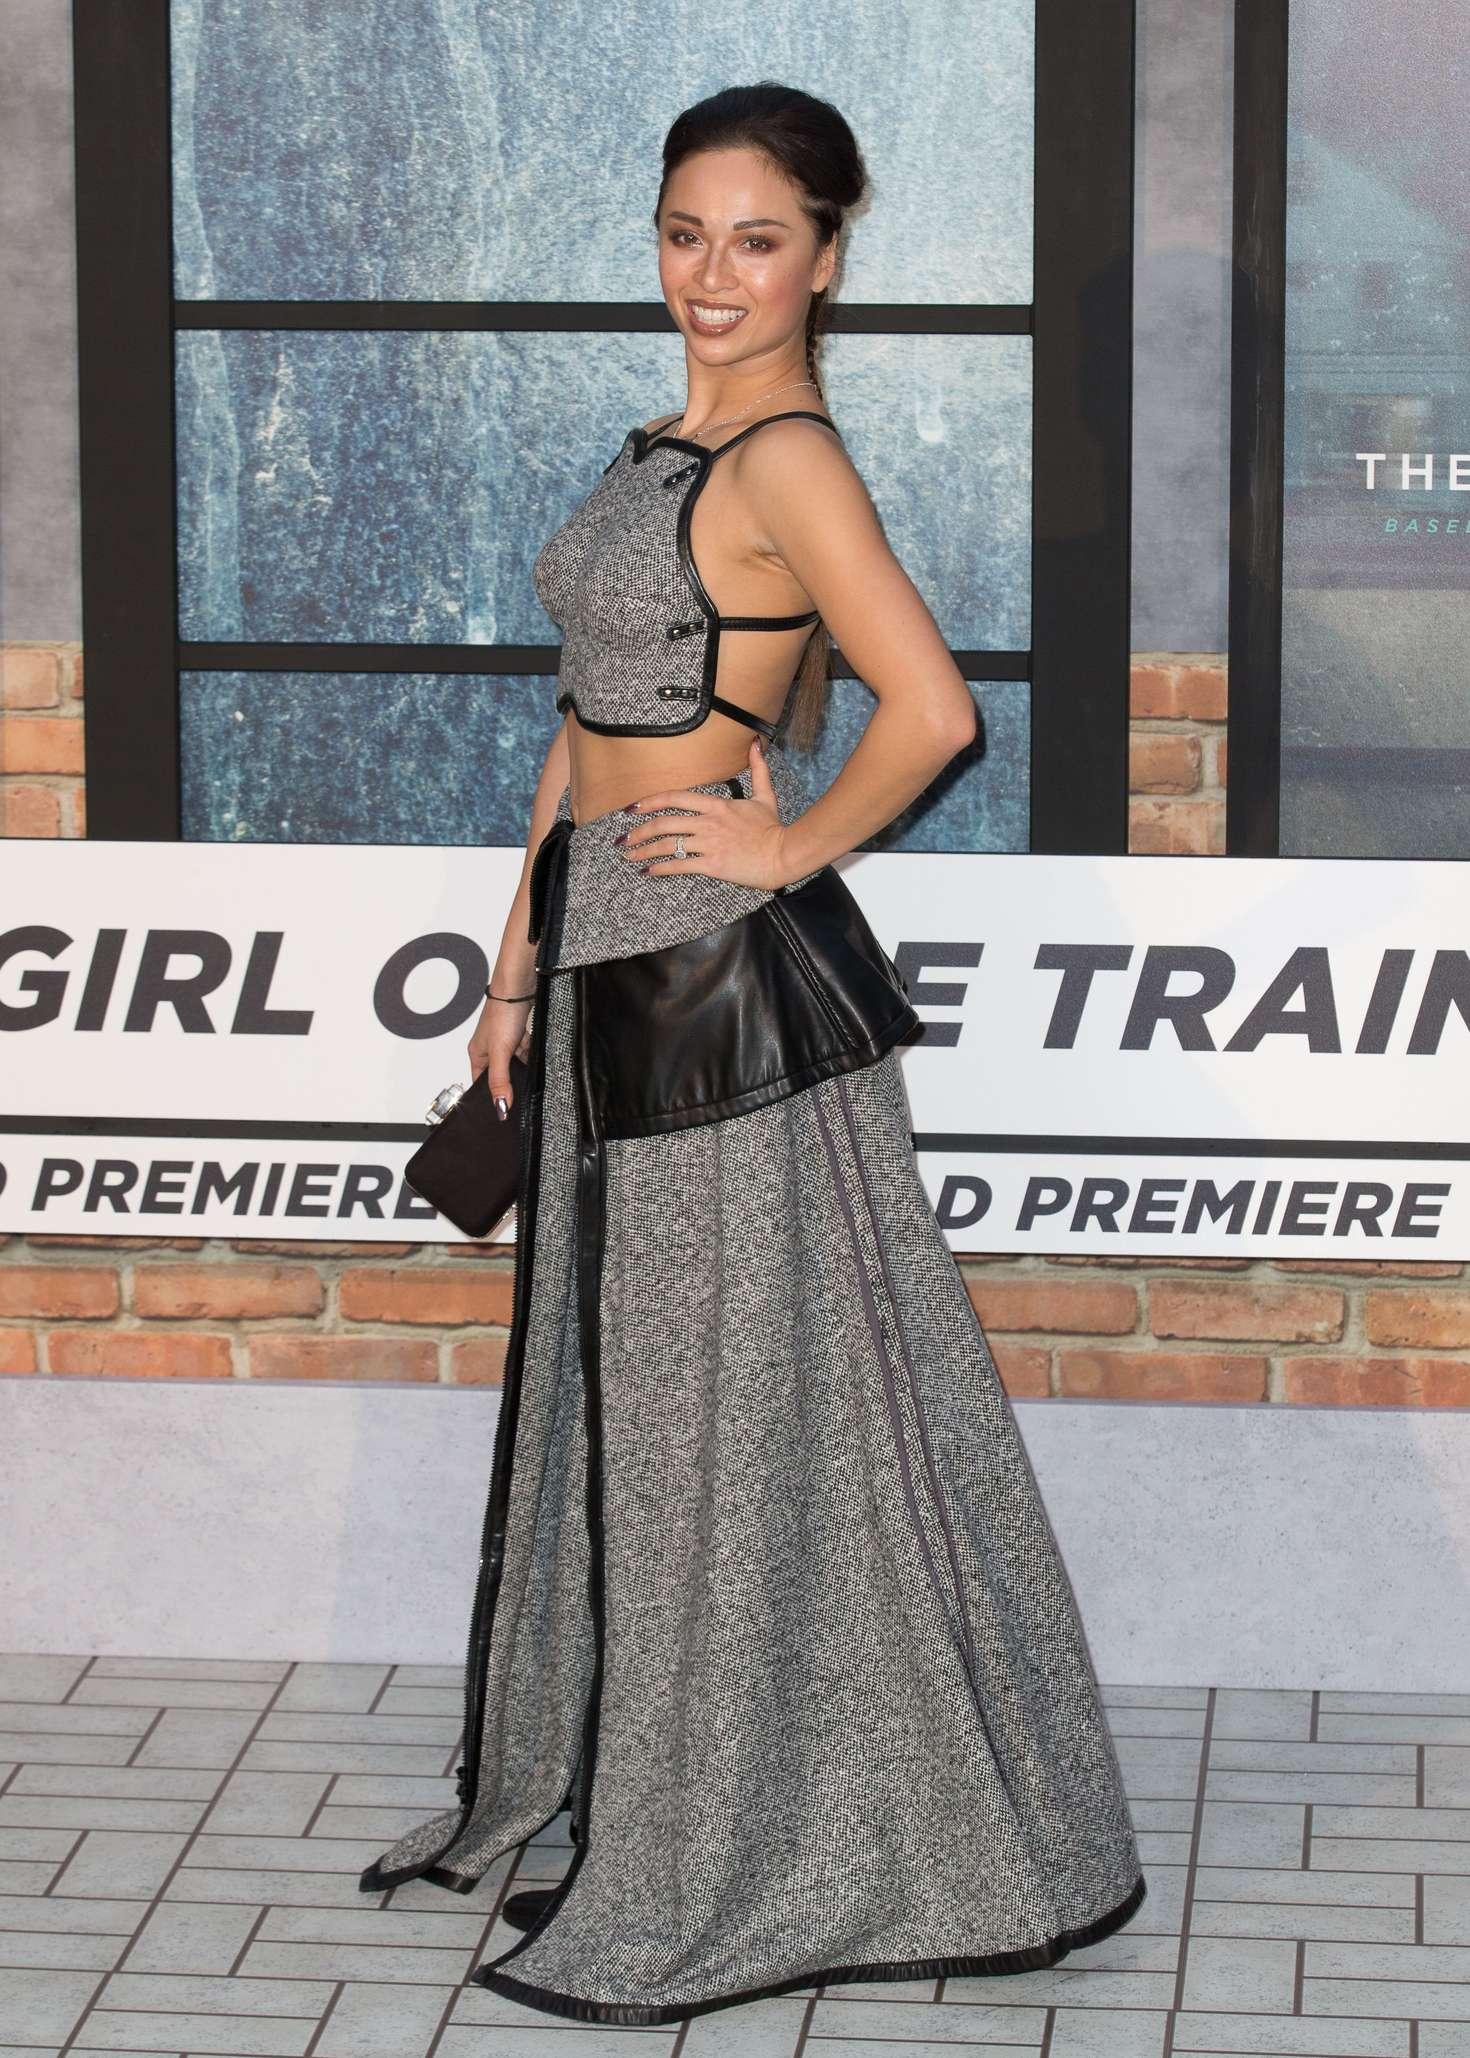 Katya Virshilas nudes (66 photos), Sexy, Paparazzi, Boobs, see through 2017